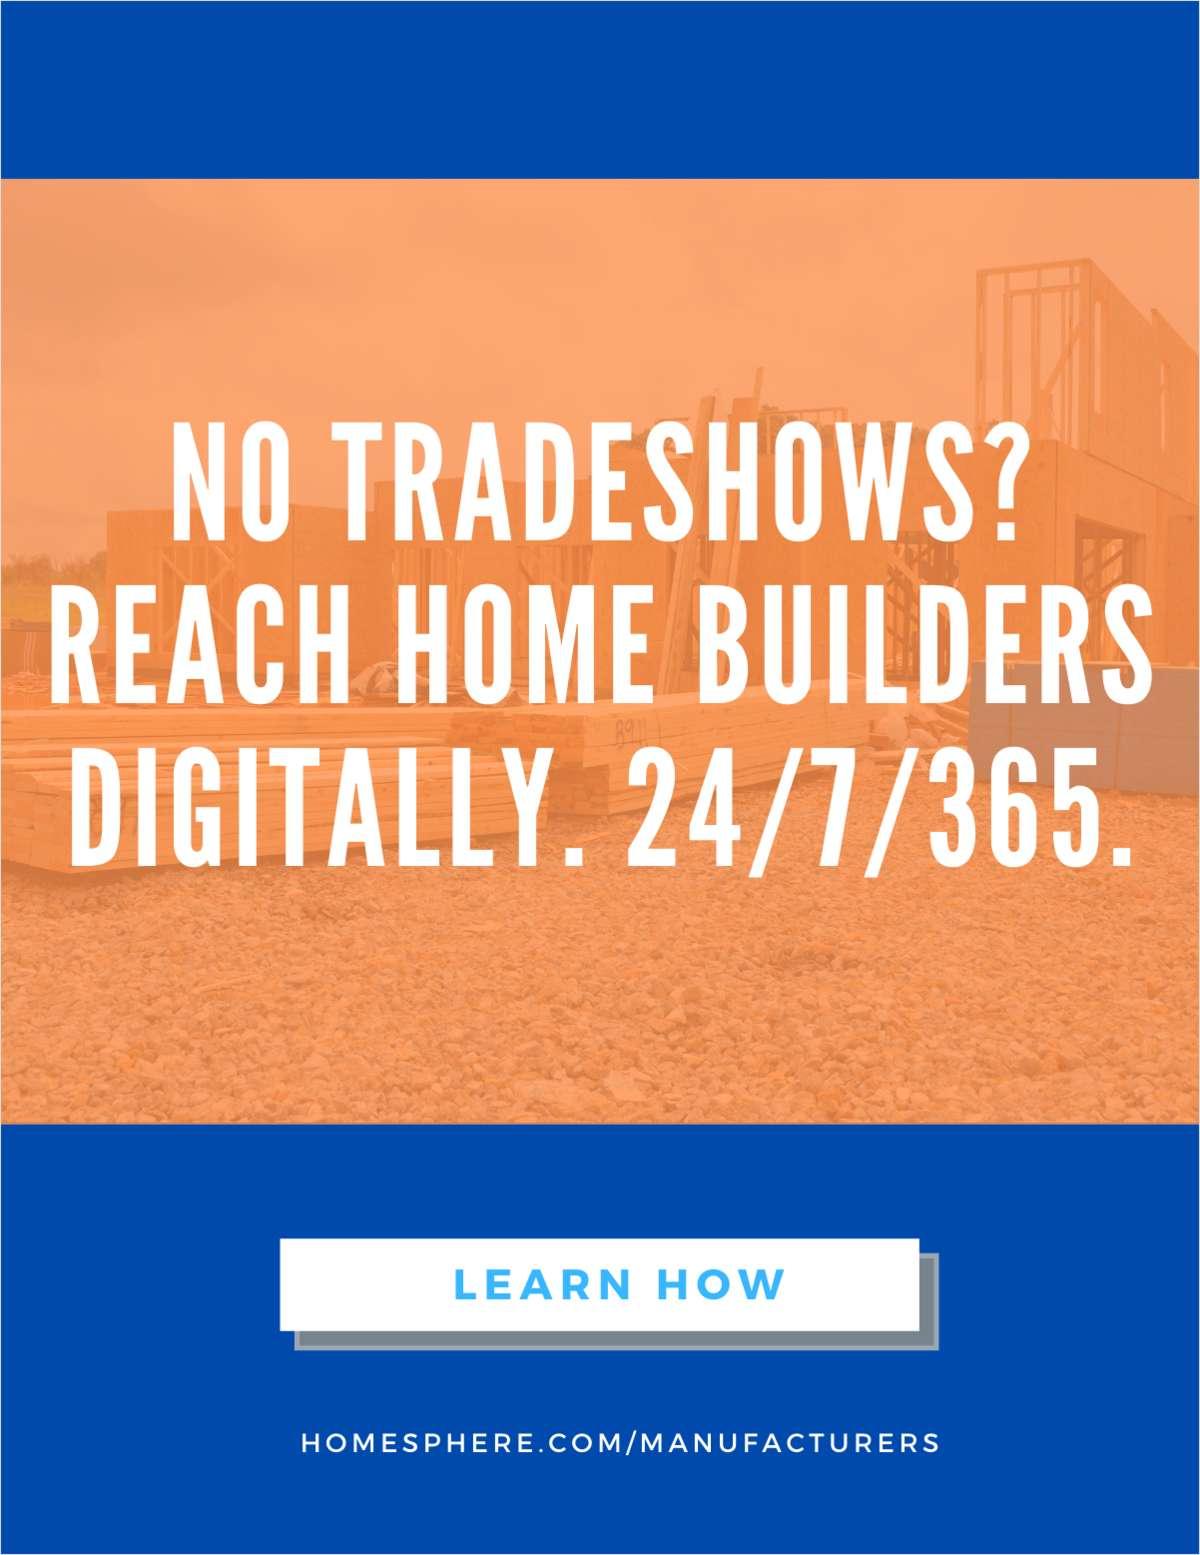 No Tradeshows? Reach Builders Digitally